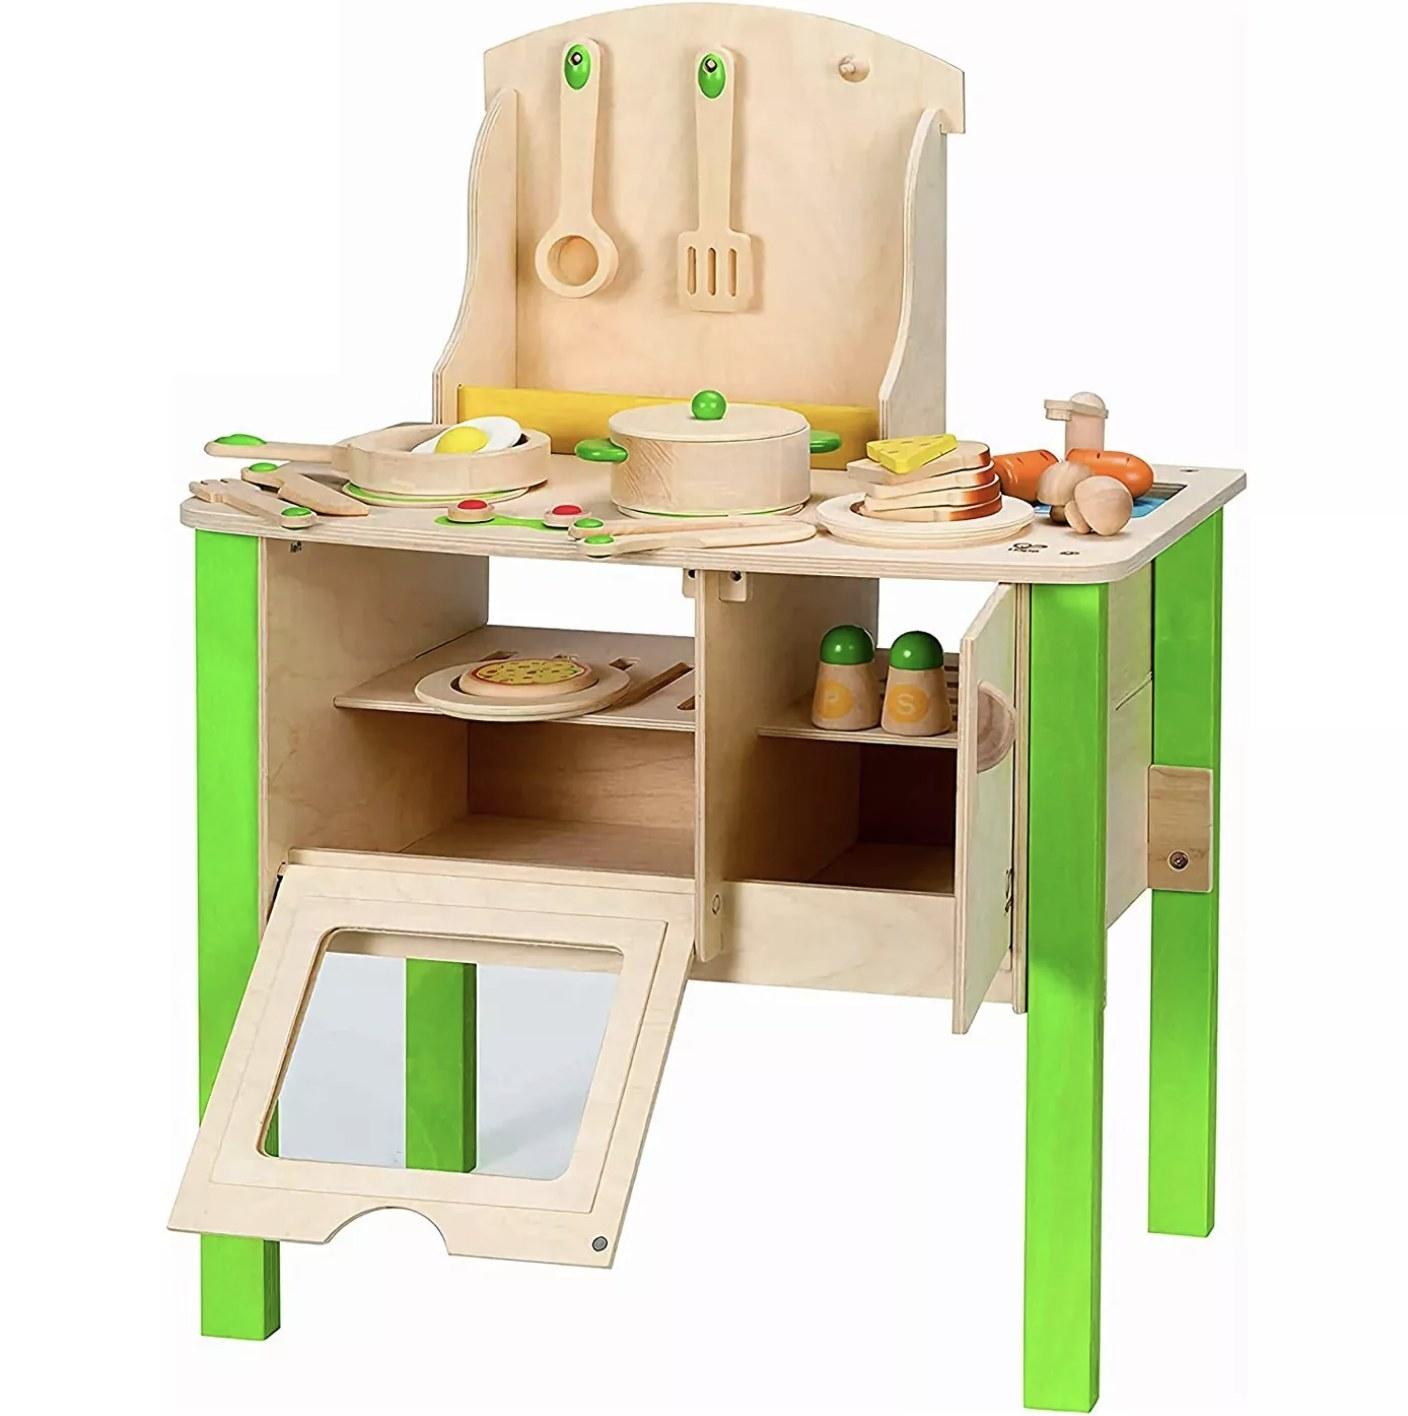 A green wooden kitchen playset